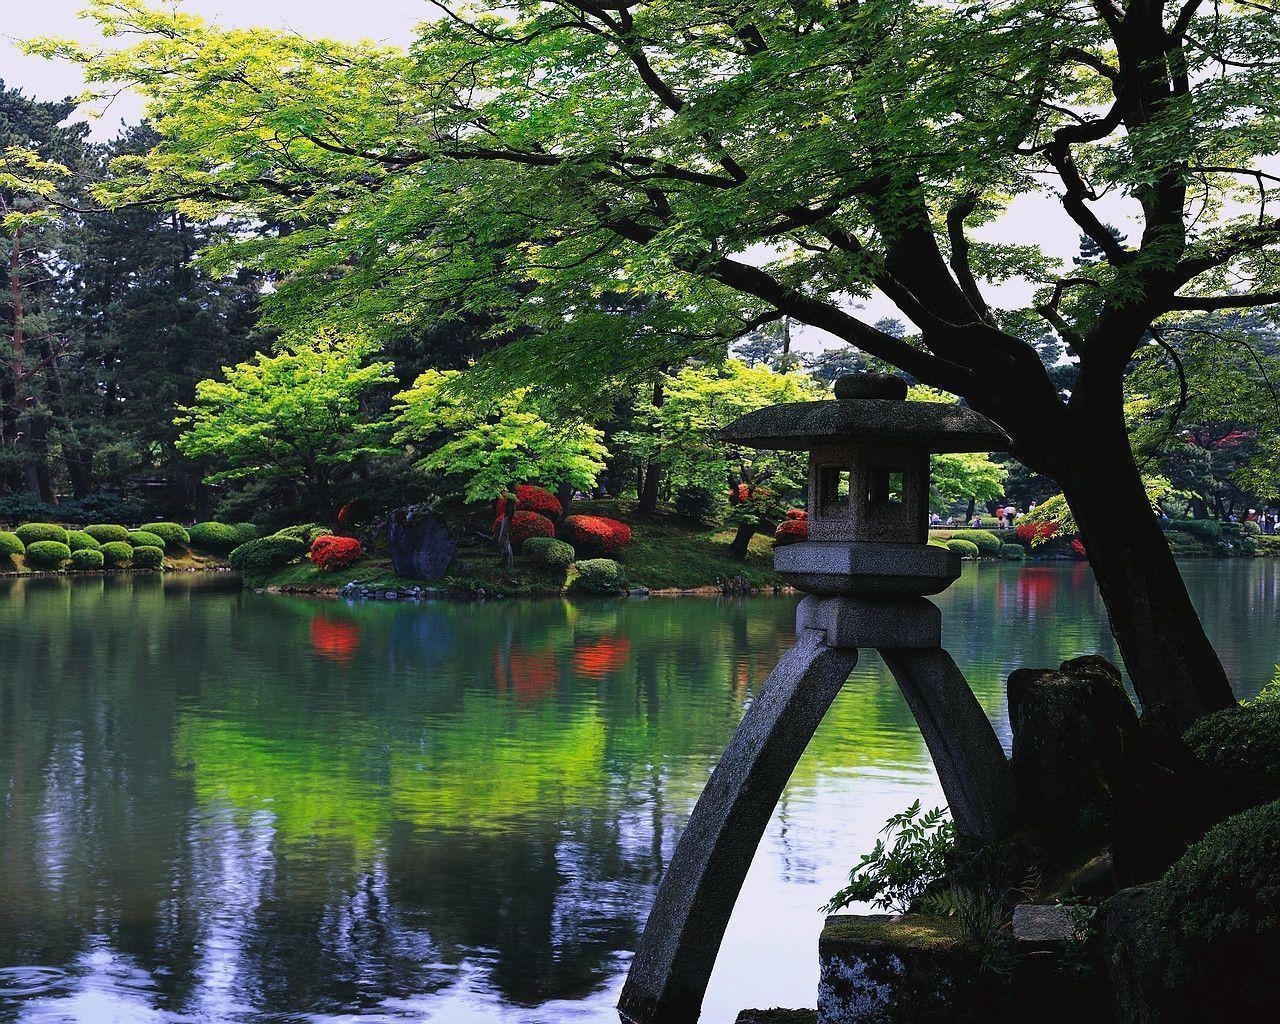 garden wallpaper zen 1920x1080px - photo #36